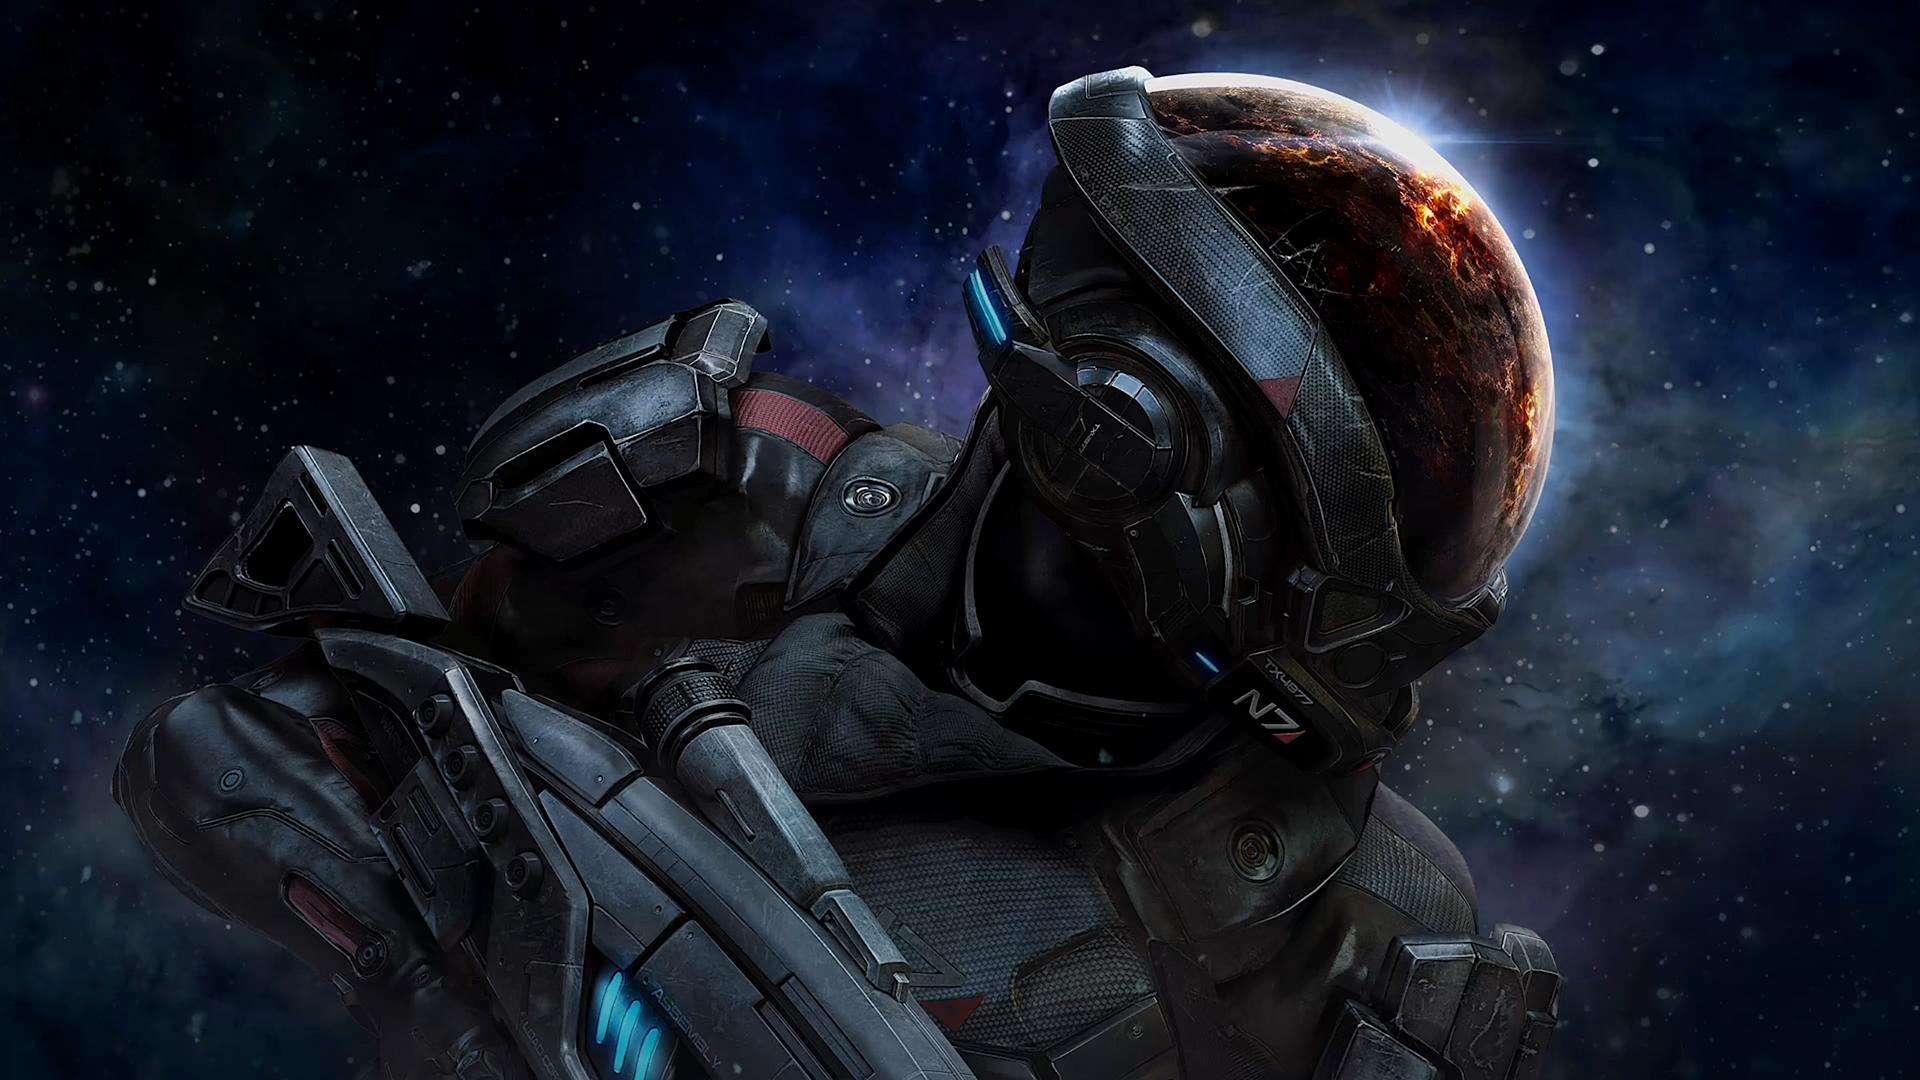 Mass Effect Andromeda Wallpaper Iphone: Desktop Wallpaper N7 Soldier Of Mass Effect: Andromeda